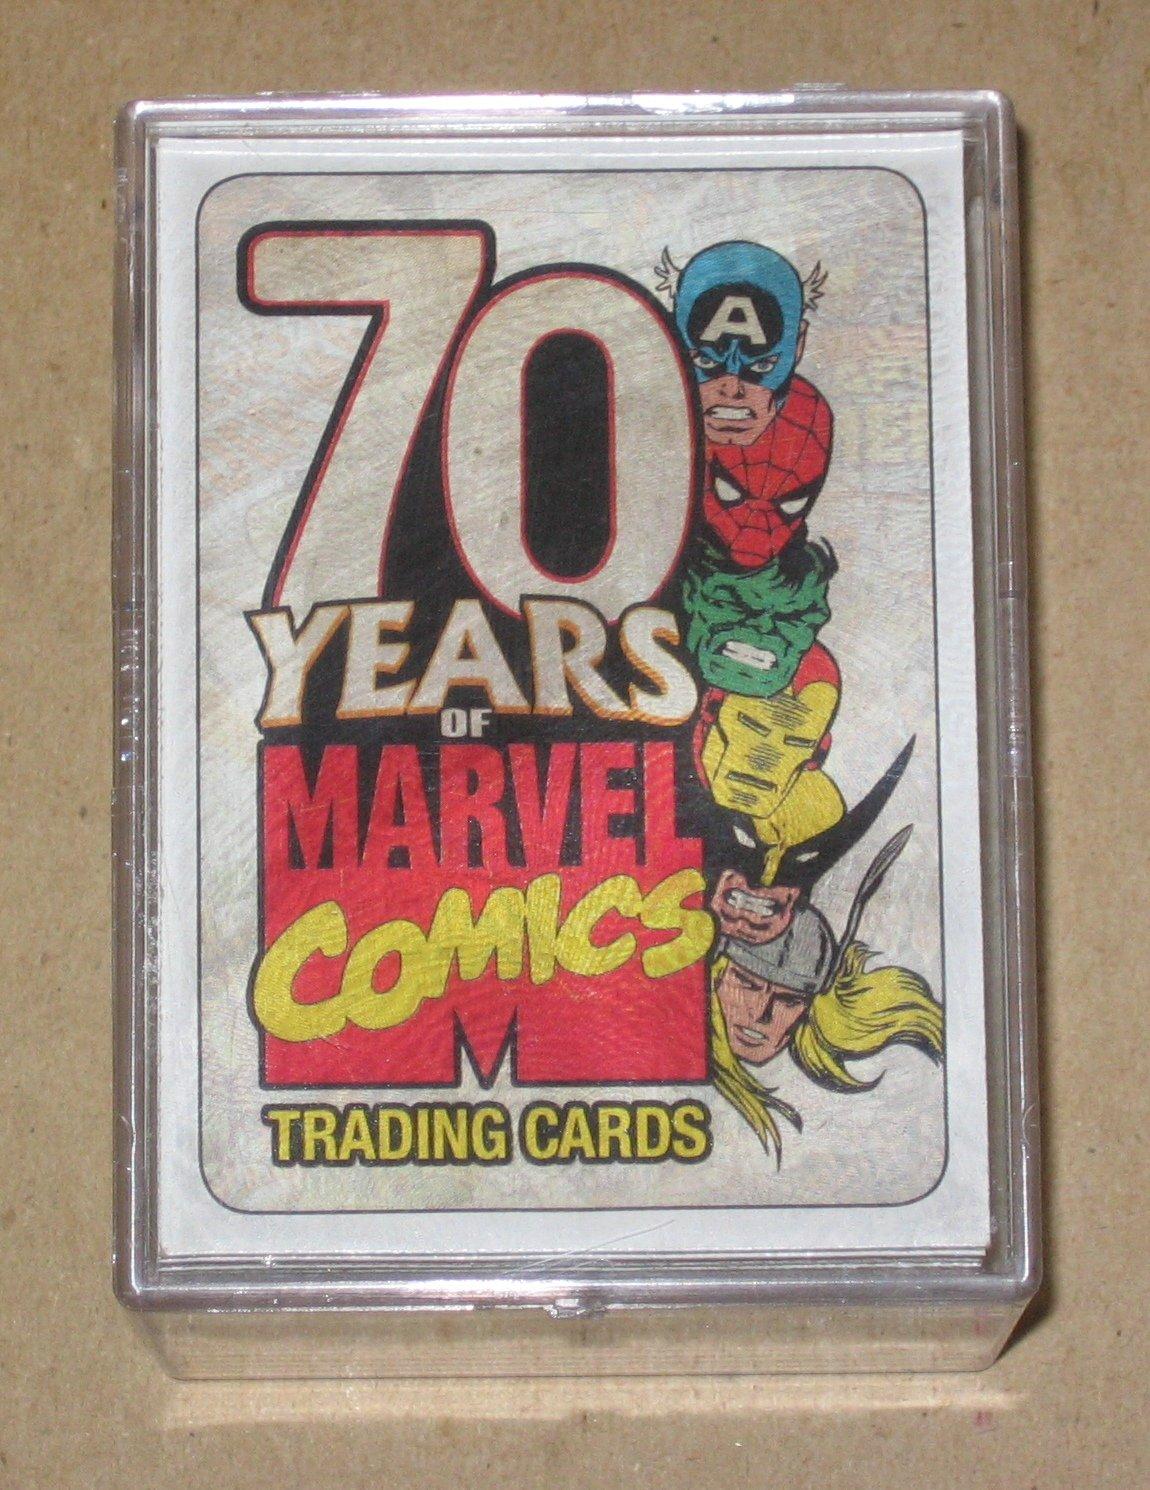 70 Years of Marvel Comics (Rittenhouse 2010) - Full 72 Base Card Set EX